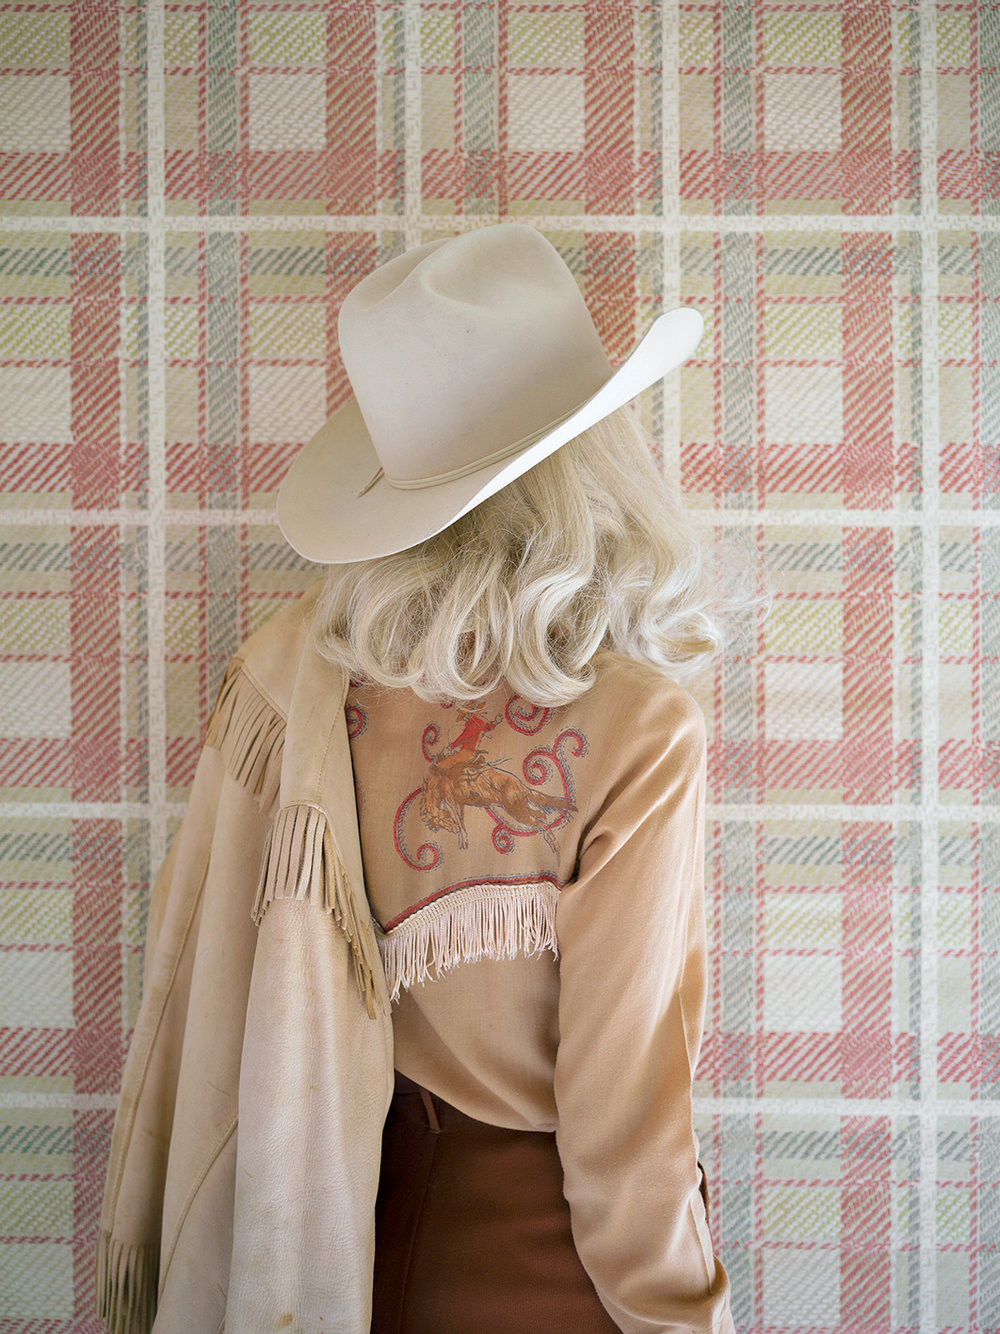 The Cowboy © Anja Niemi _ The Little Black Gallery.jpg